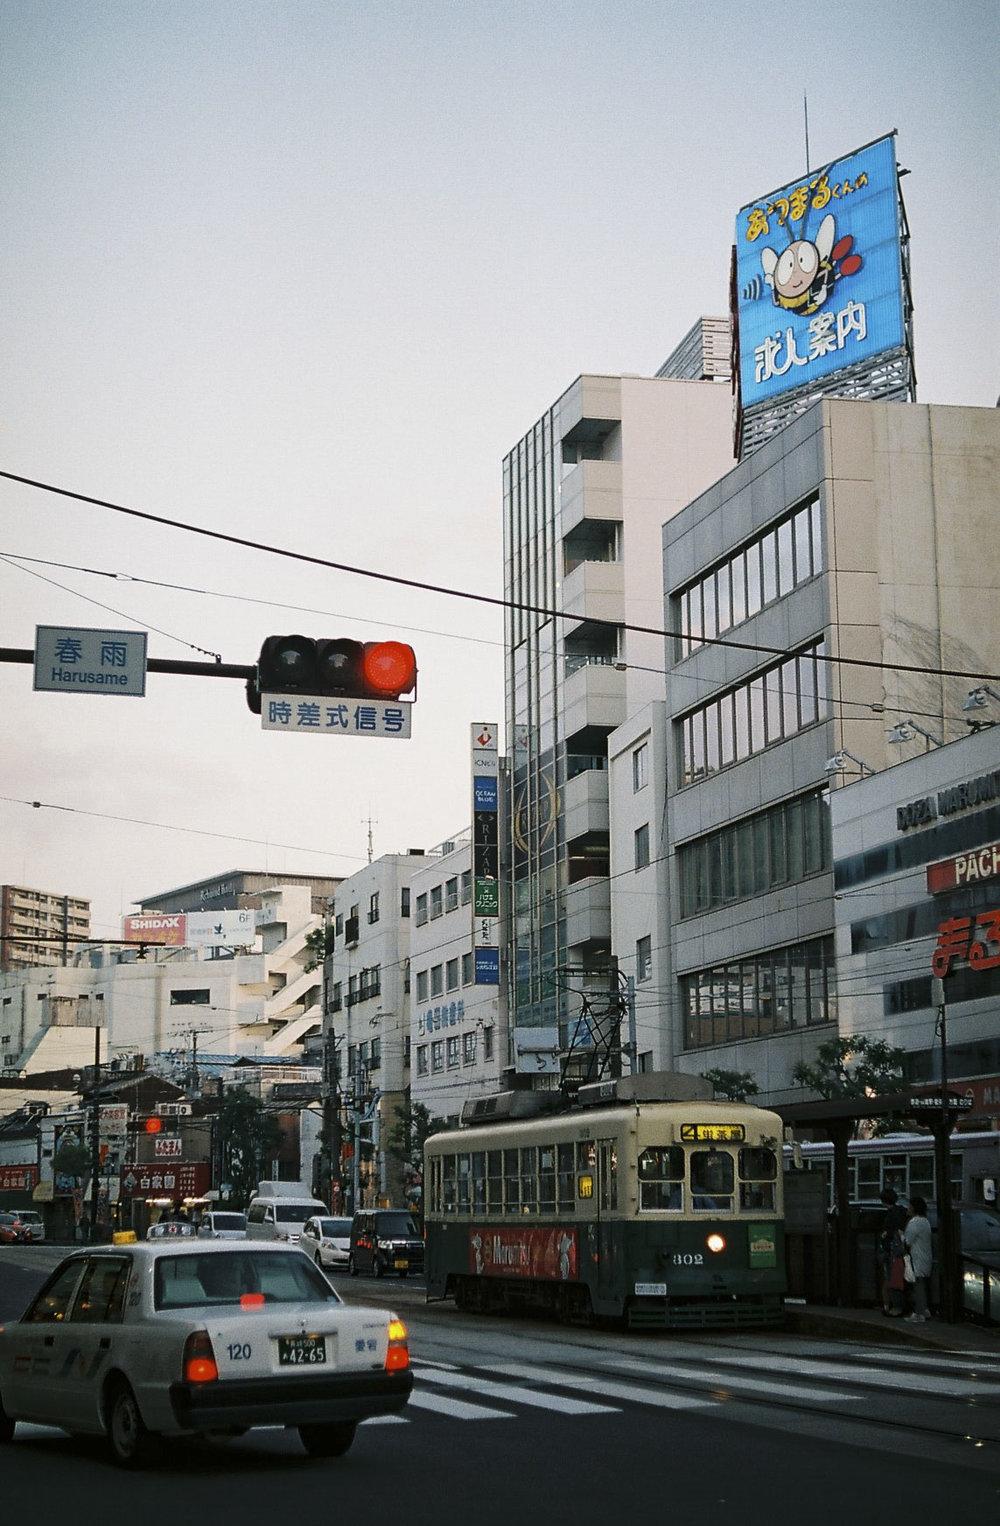 BDAY_LA_JAPAN_SNAP_LQ_163.JPG